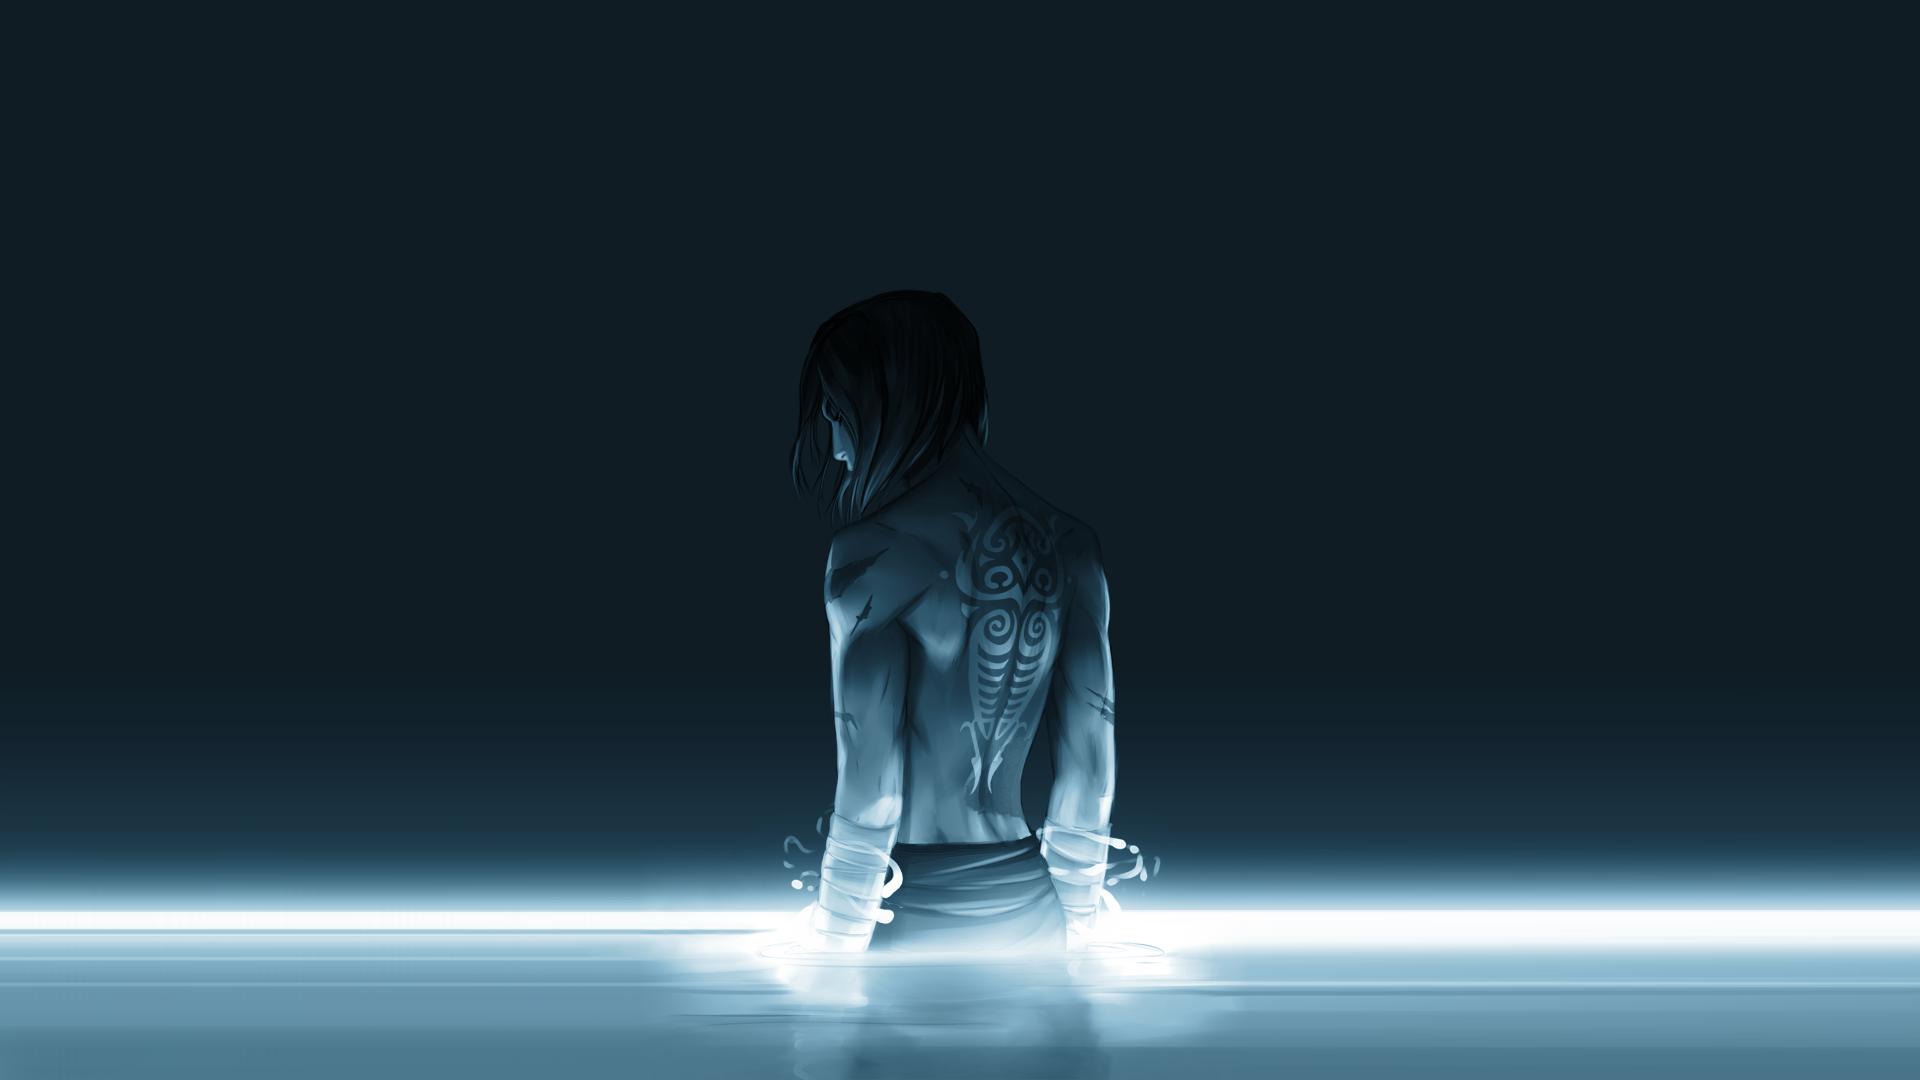 Anime 1920x1080 Avatar: The Last Airbender The Legend of Korra anime simple background